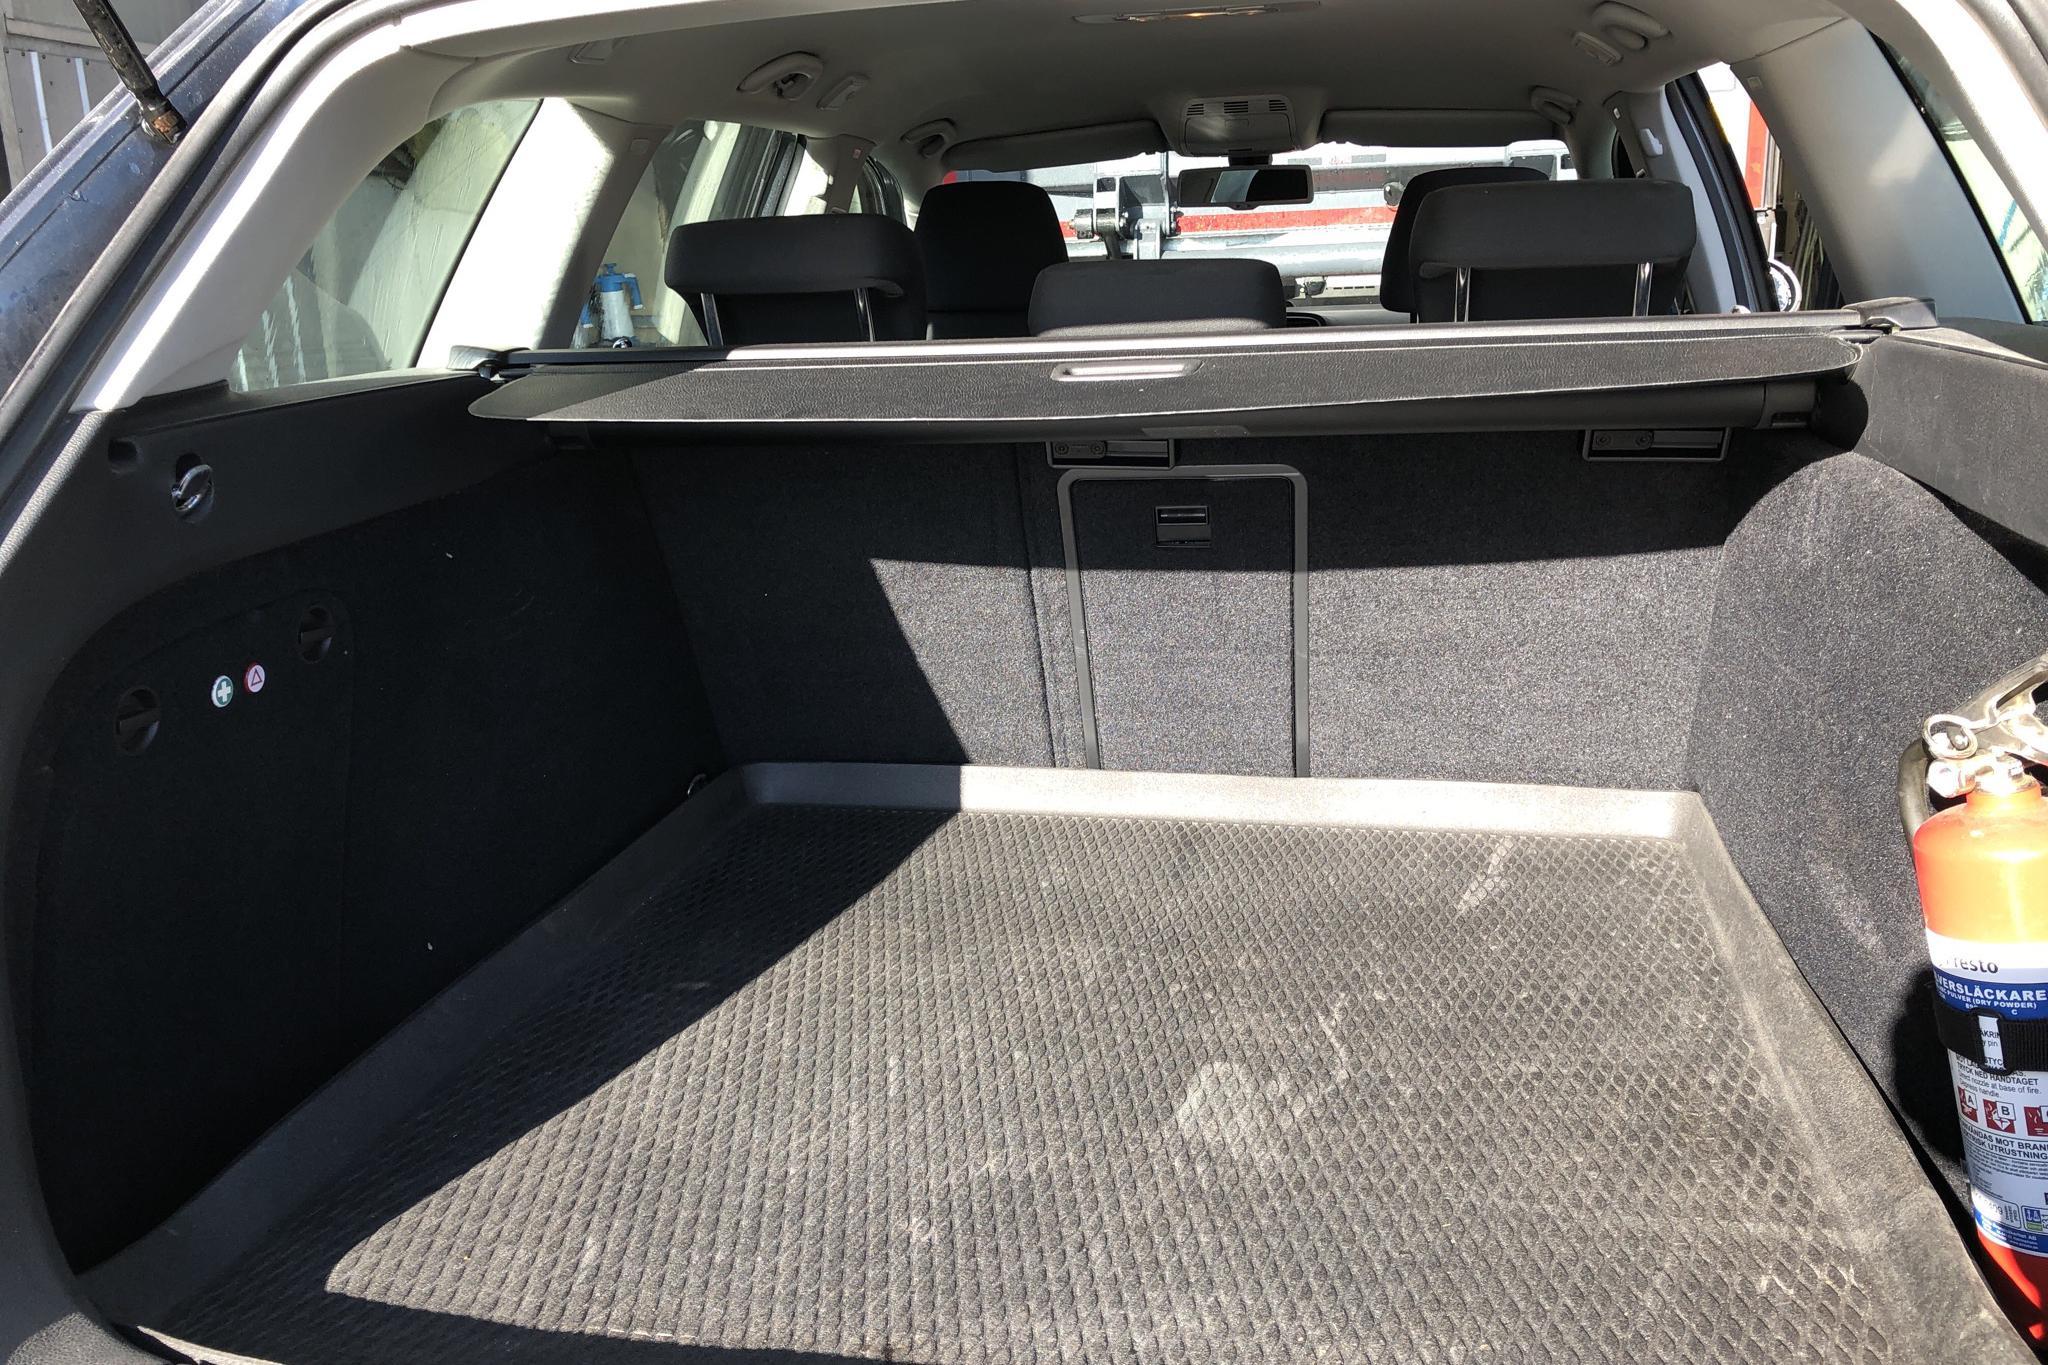 VW Golf VI 1.6 TDI Variant 4motion (105hk) - 0 mil - Manuell - Dark Grey - 2013